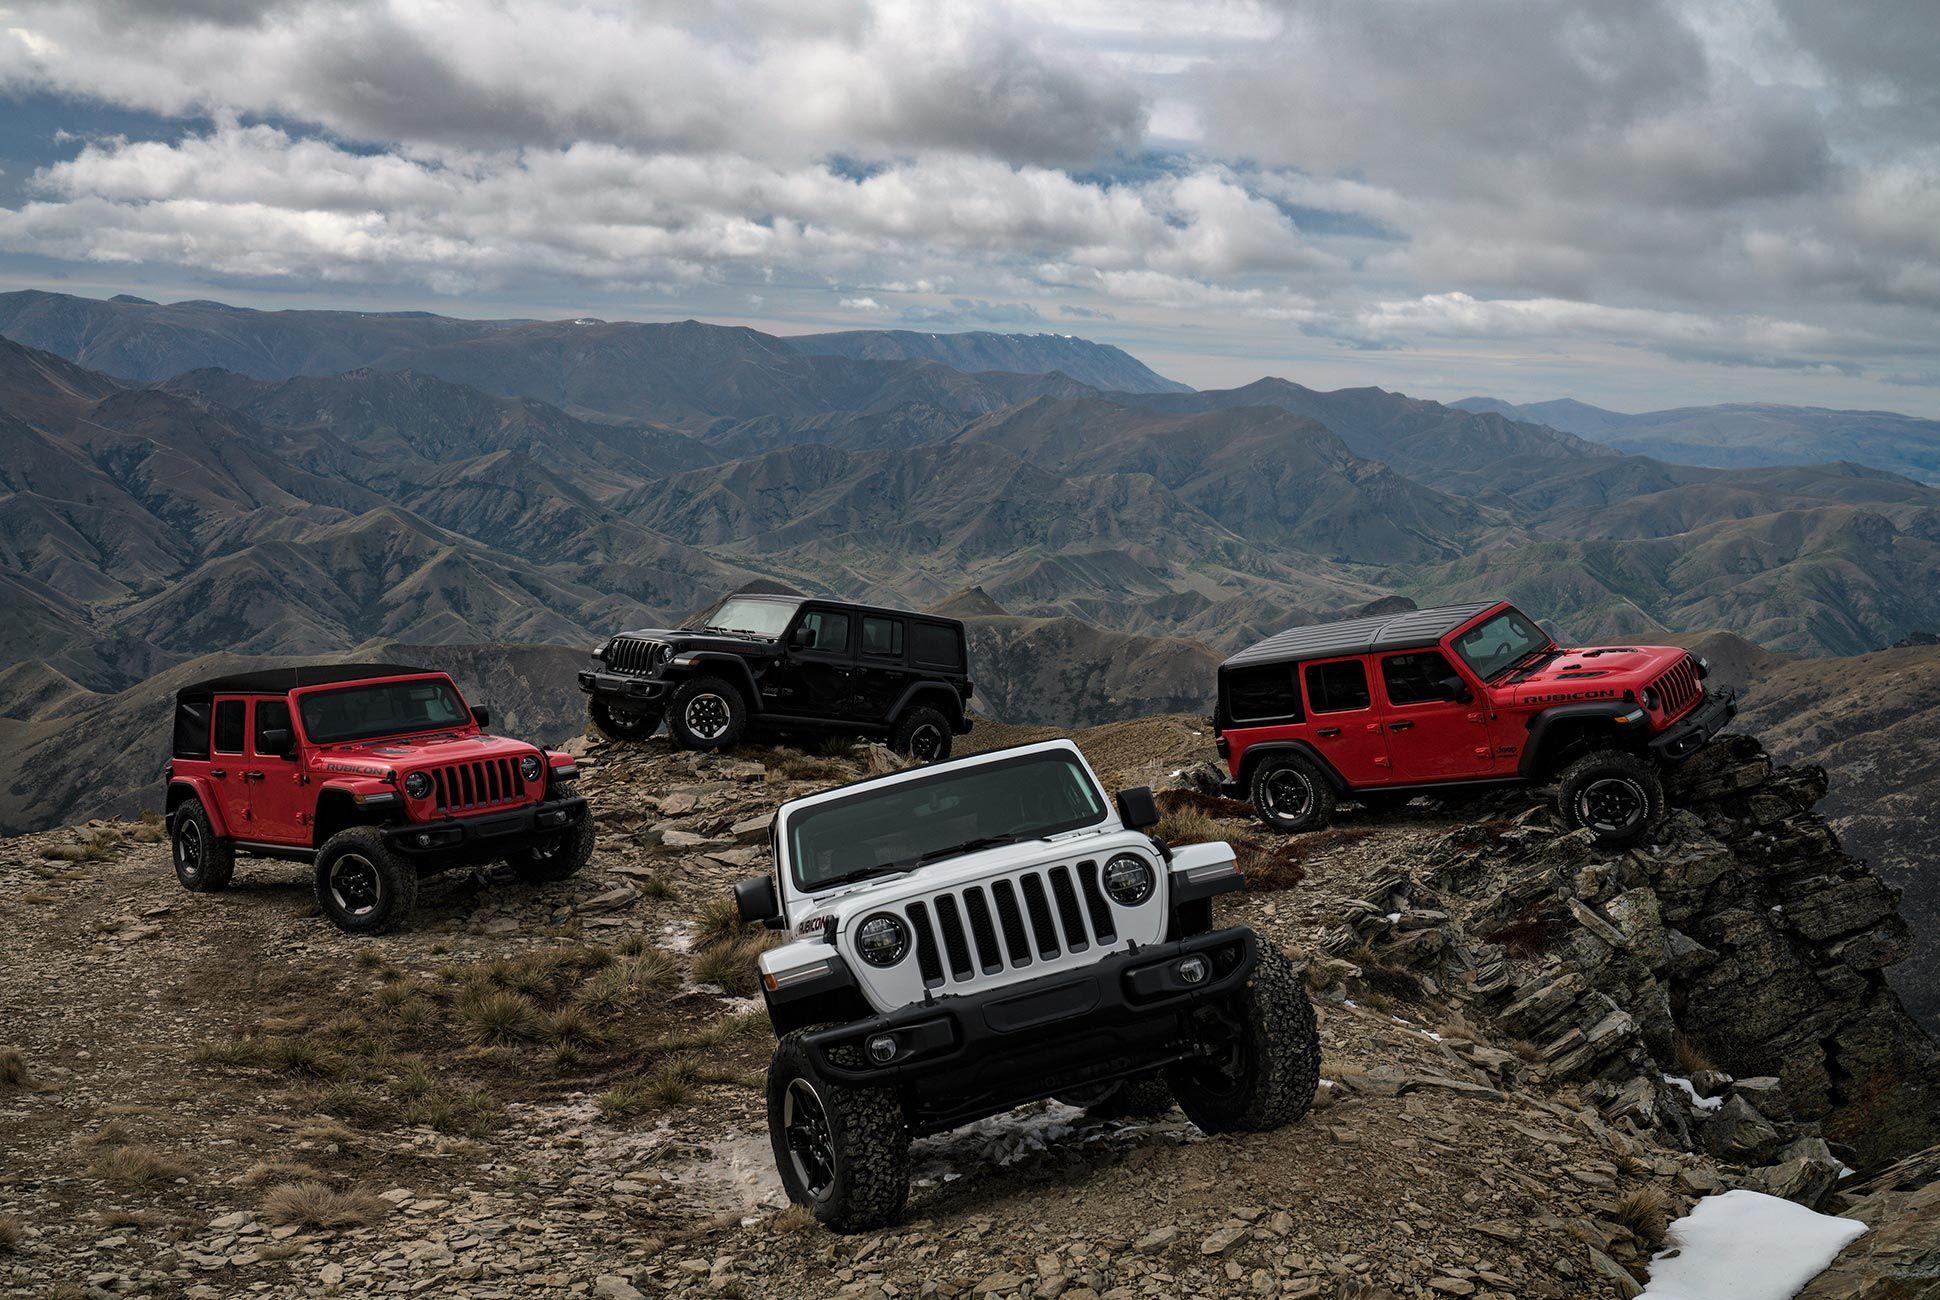 2018-Jeep-Wrangler-Review-gear-patrol-9